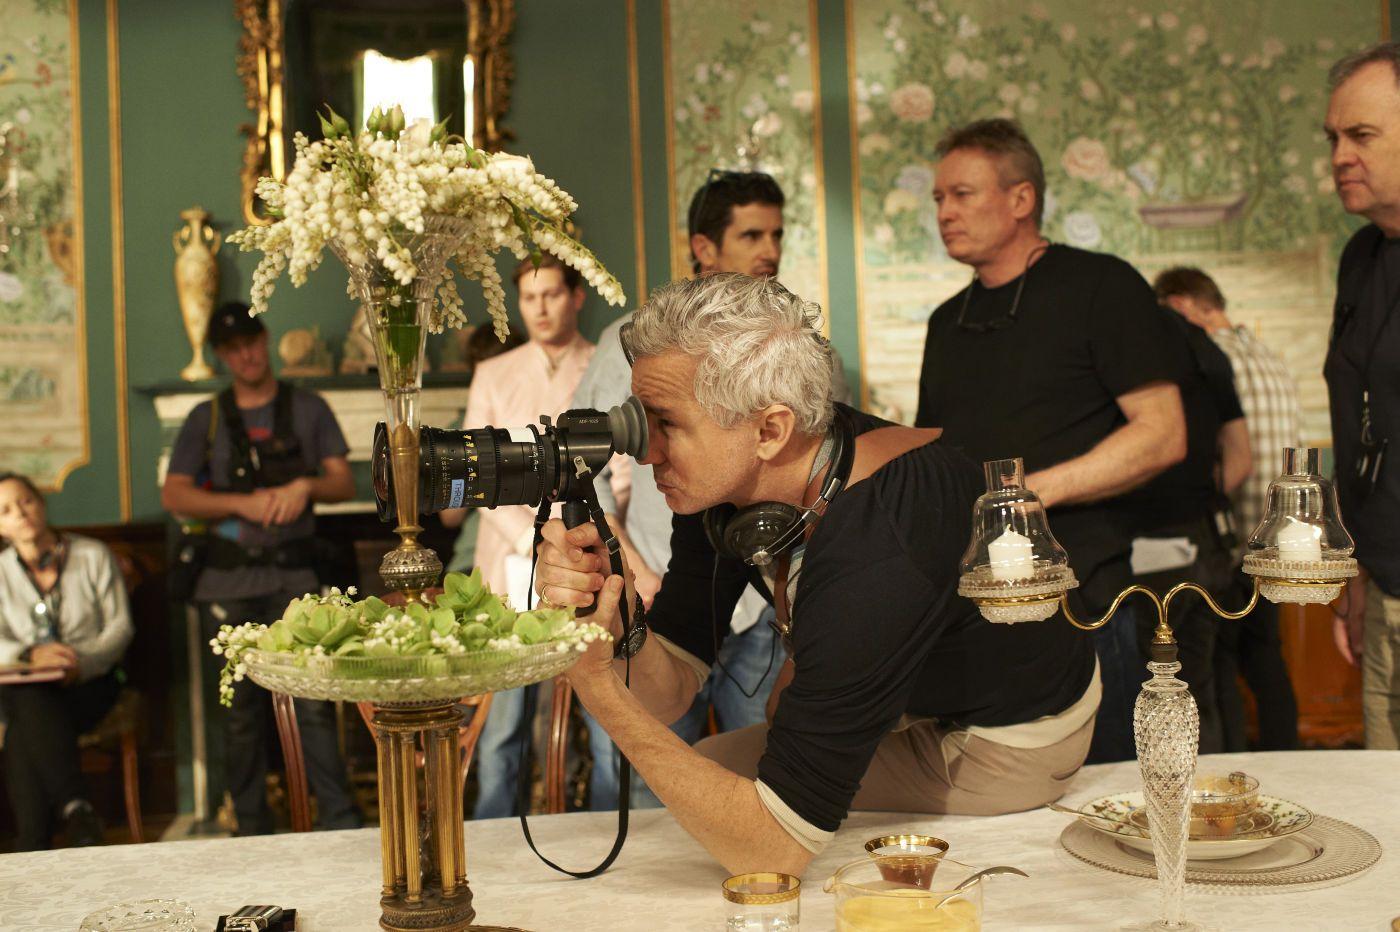 The Great Gatsby - Baz Luhrmann on set